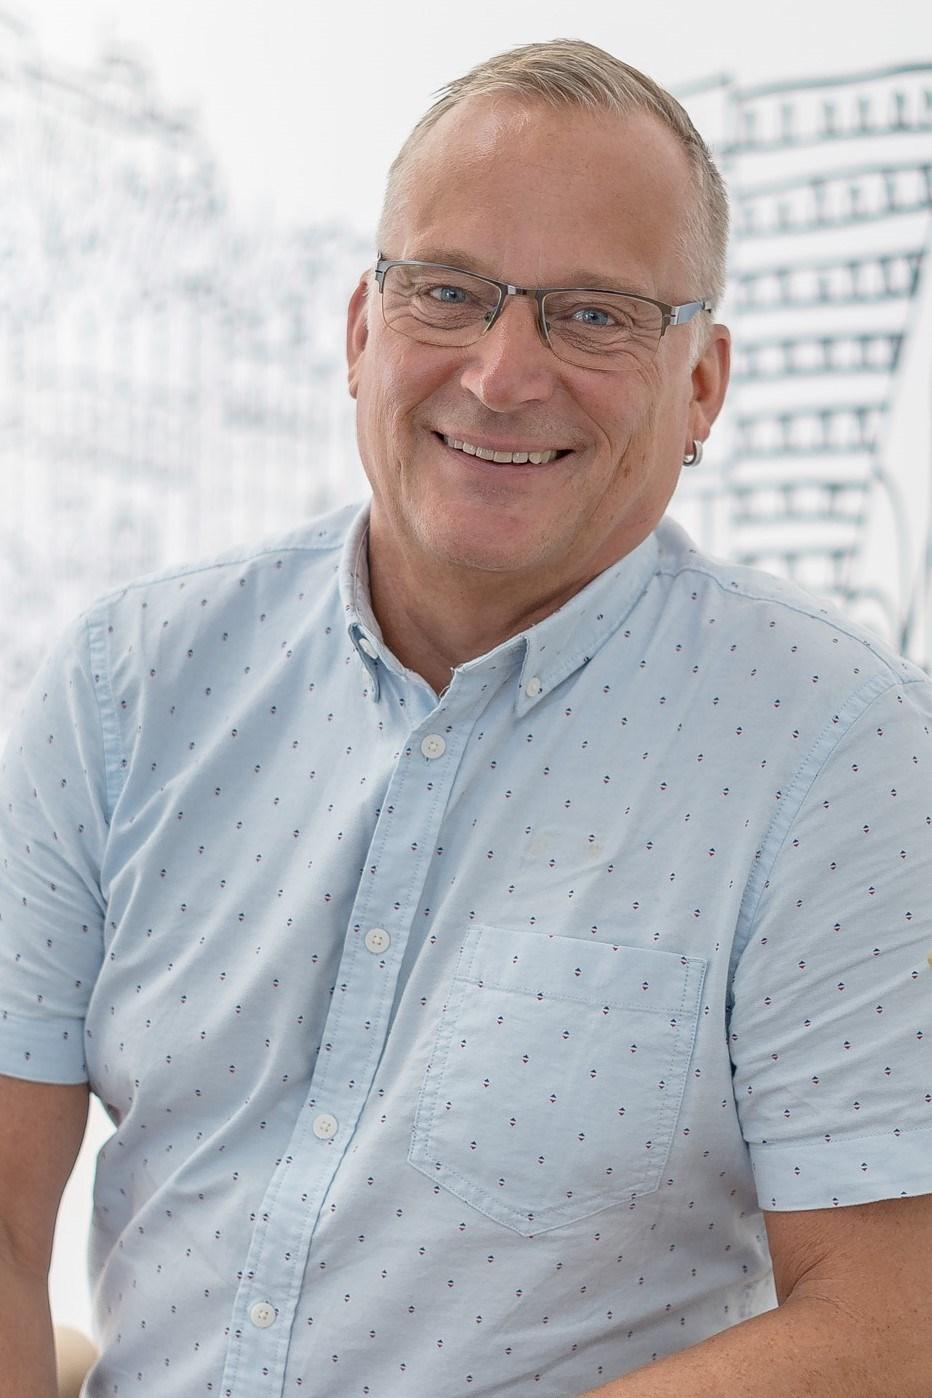 Mats Laaksonen